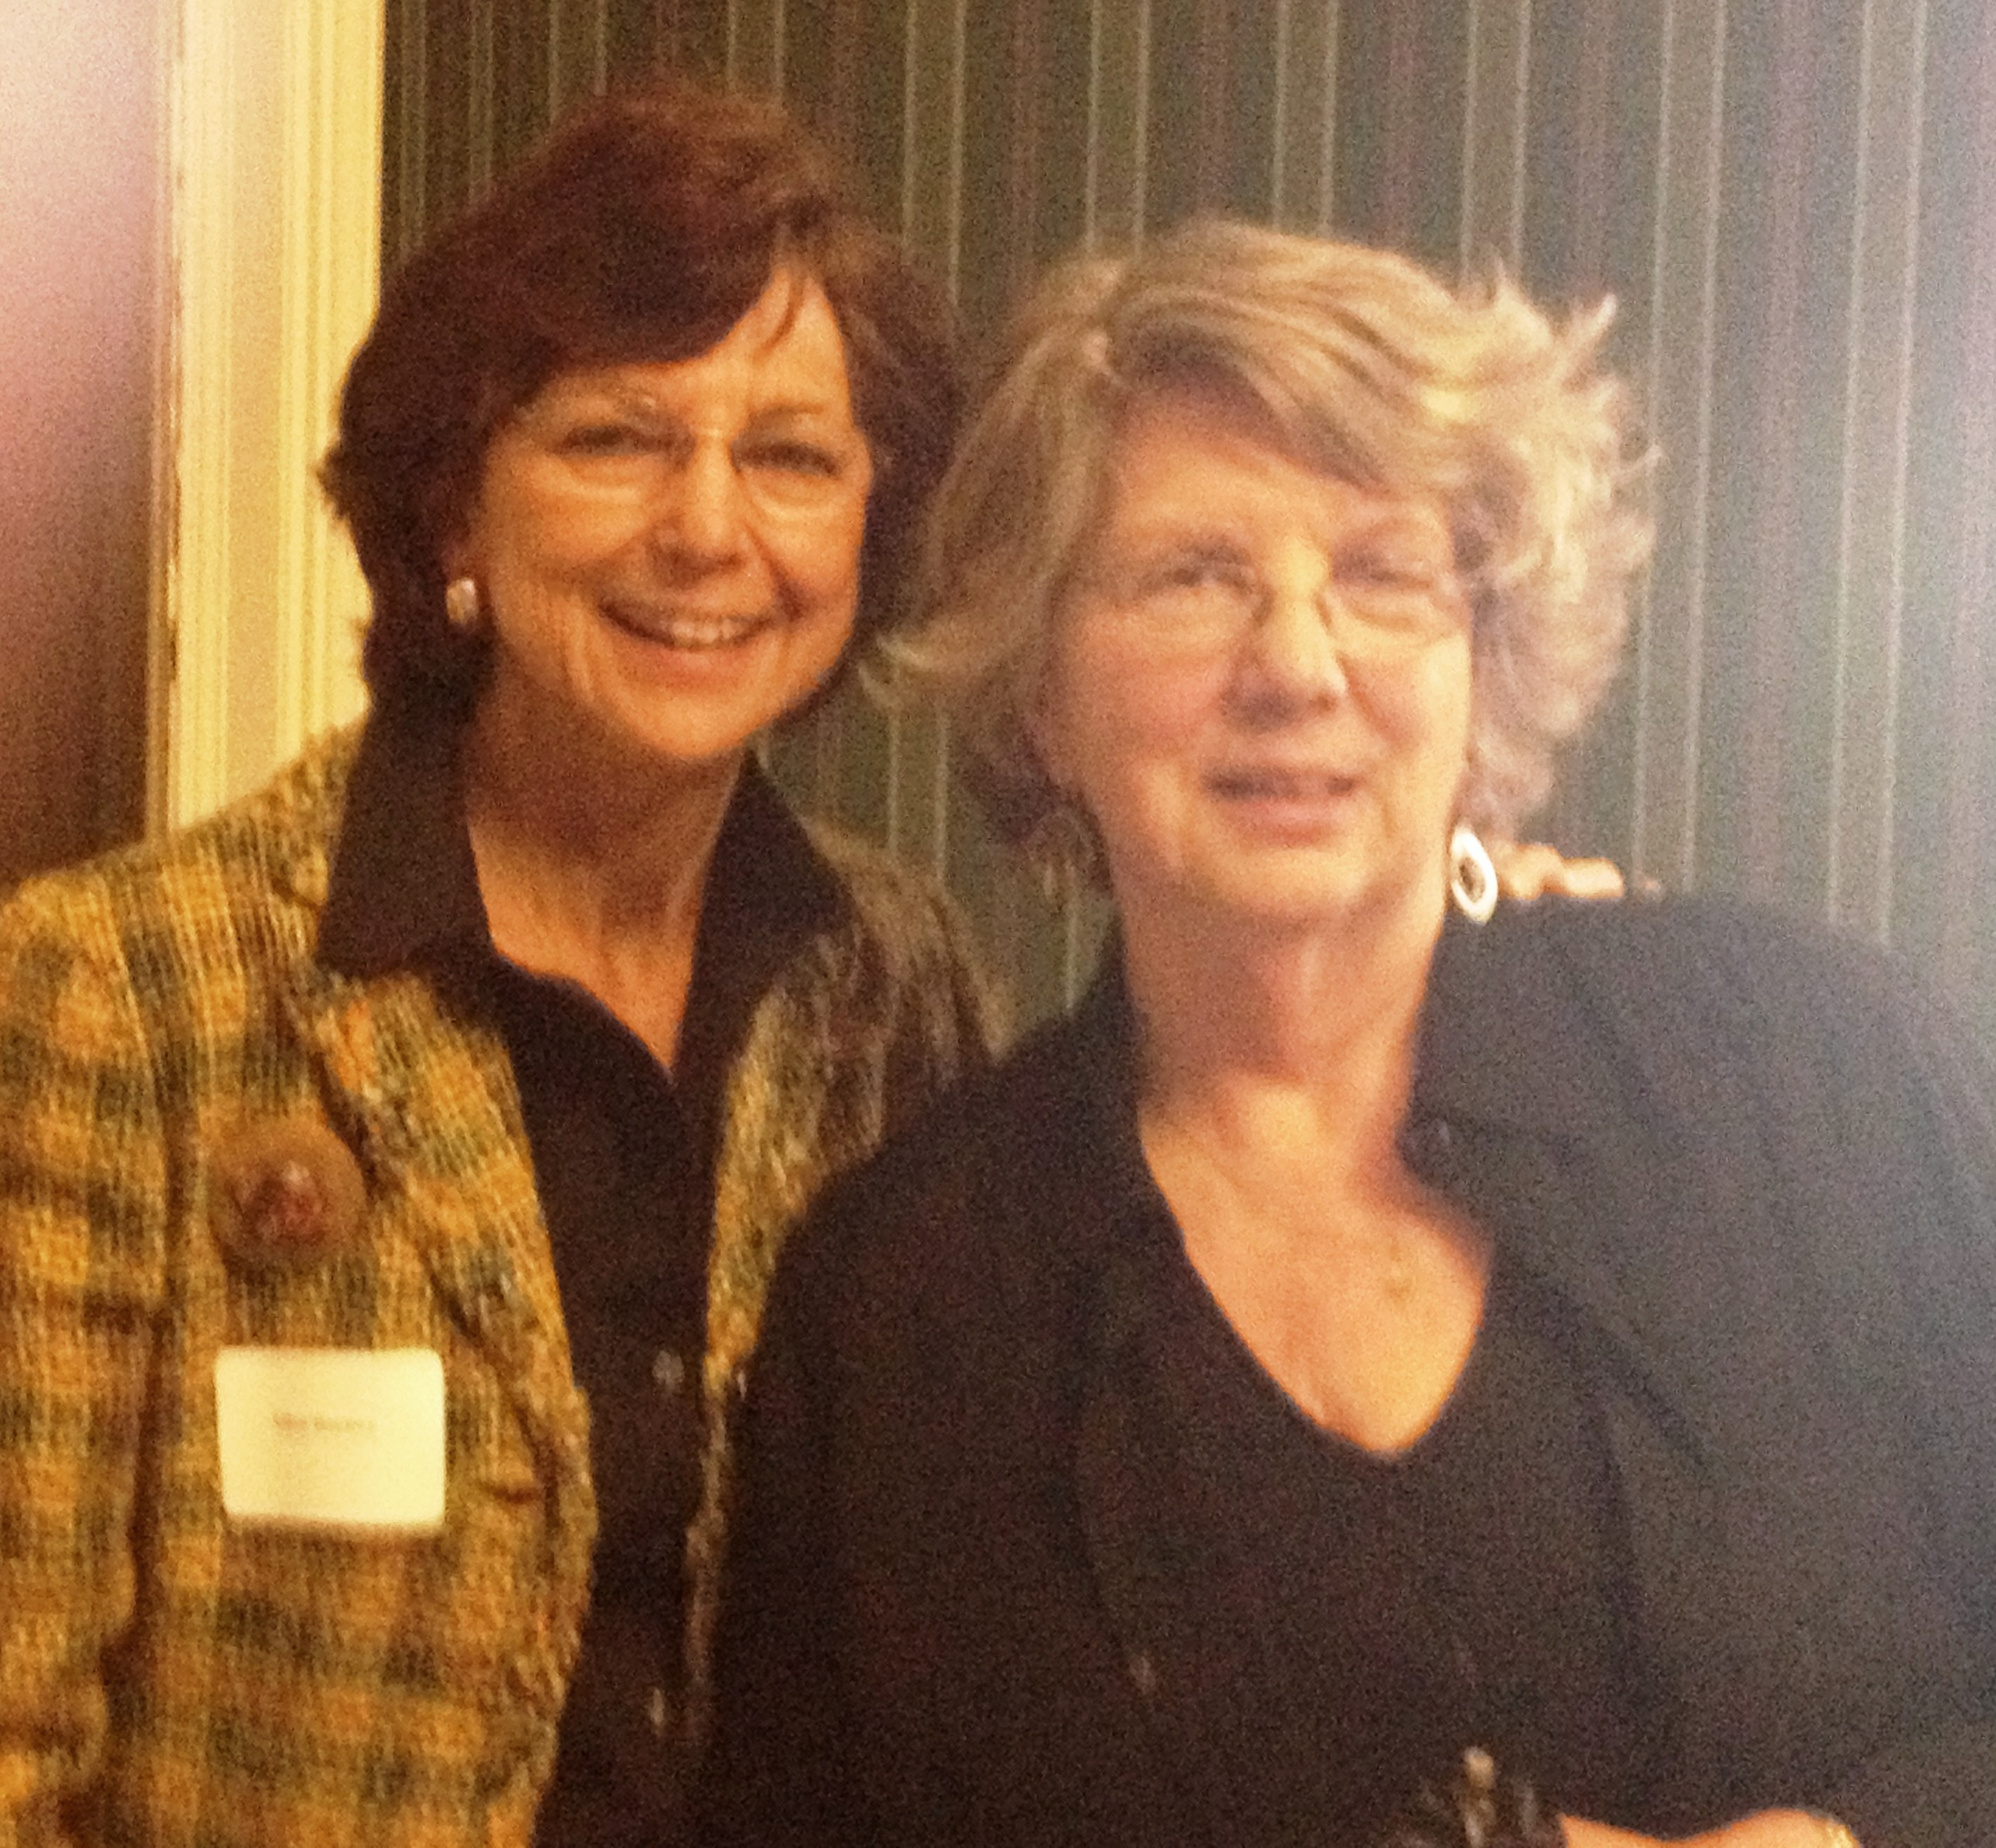 Marsha linehan and sister, Aline Haynes